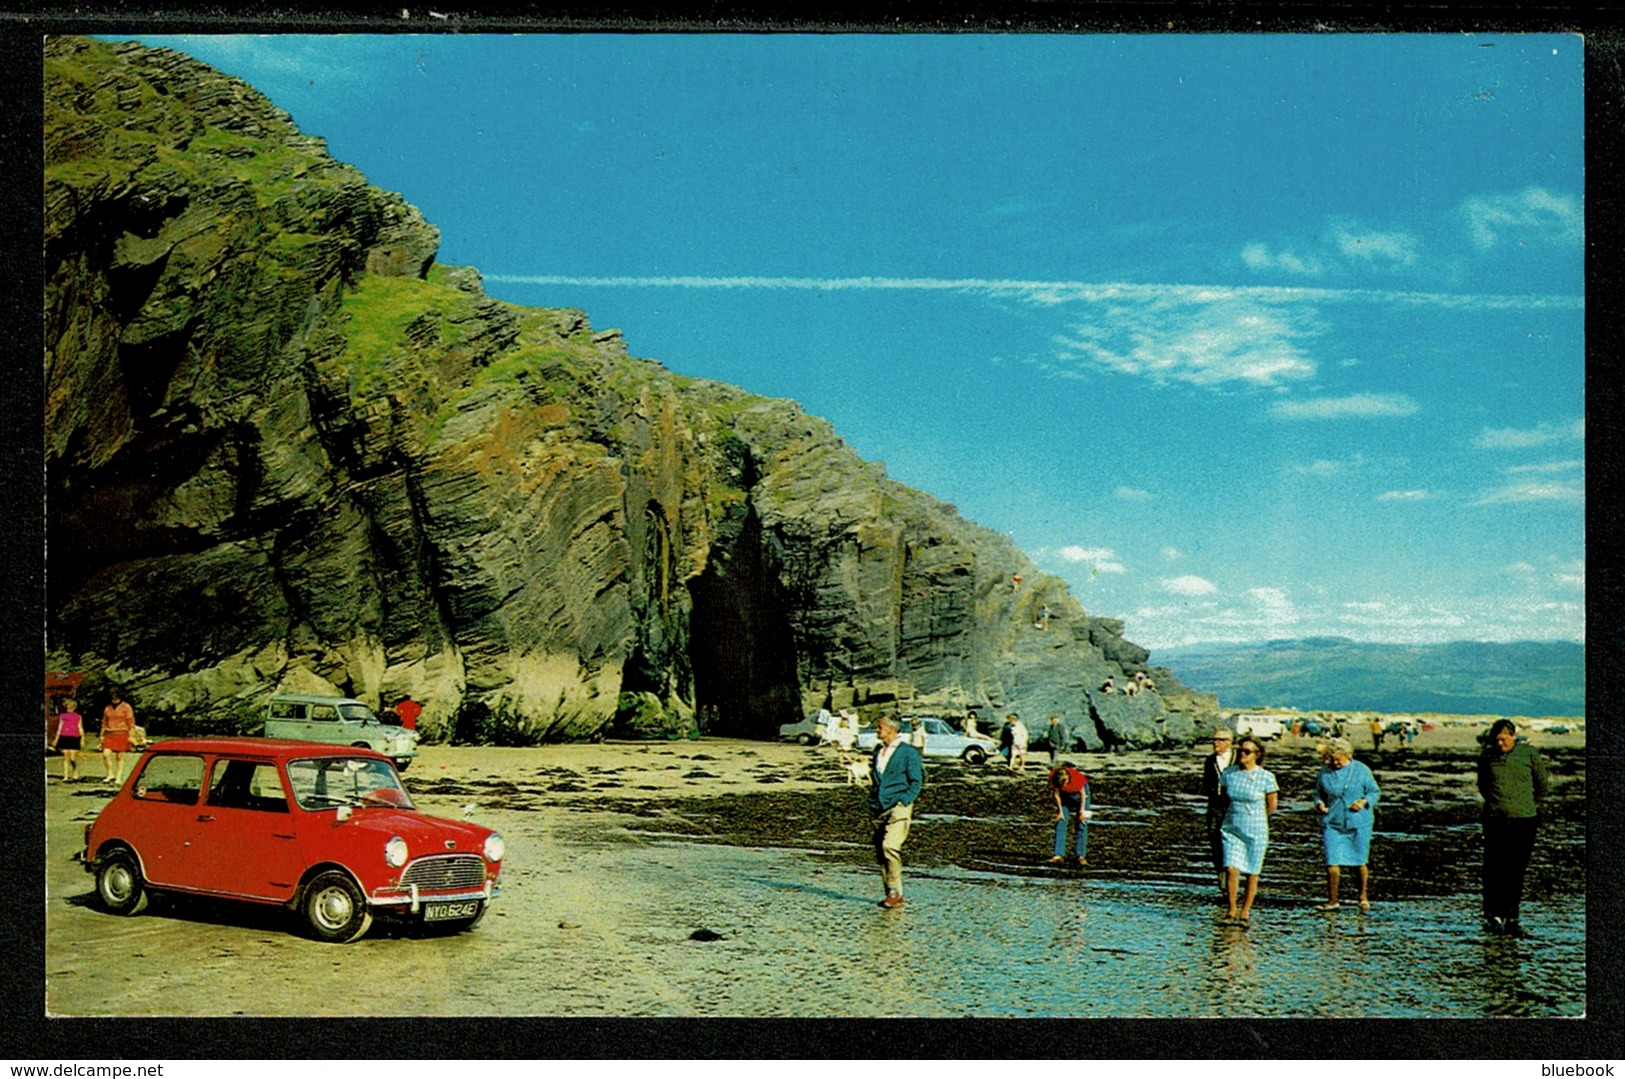 Ref 1317 - Postcard - Mini Car Close-Up - Black Rock - Morfa Bychan Caernarvonshire Wales - Caernarvonshire